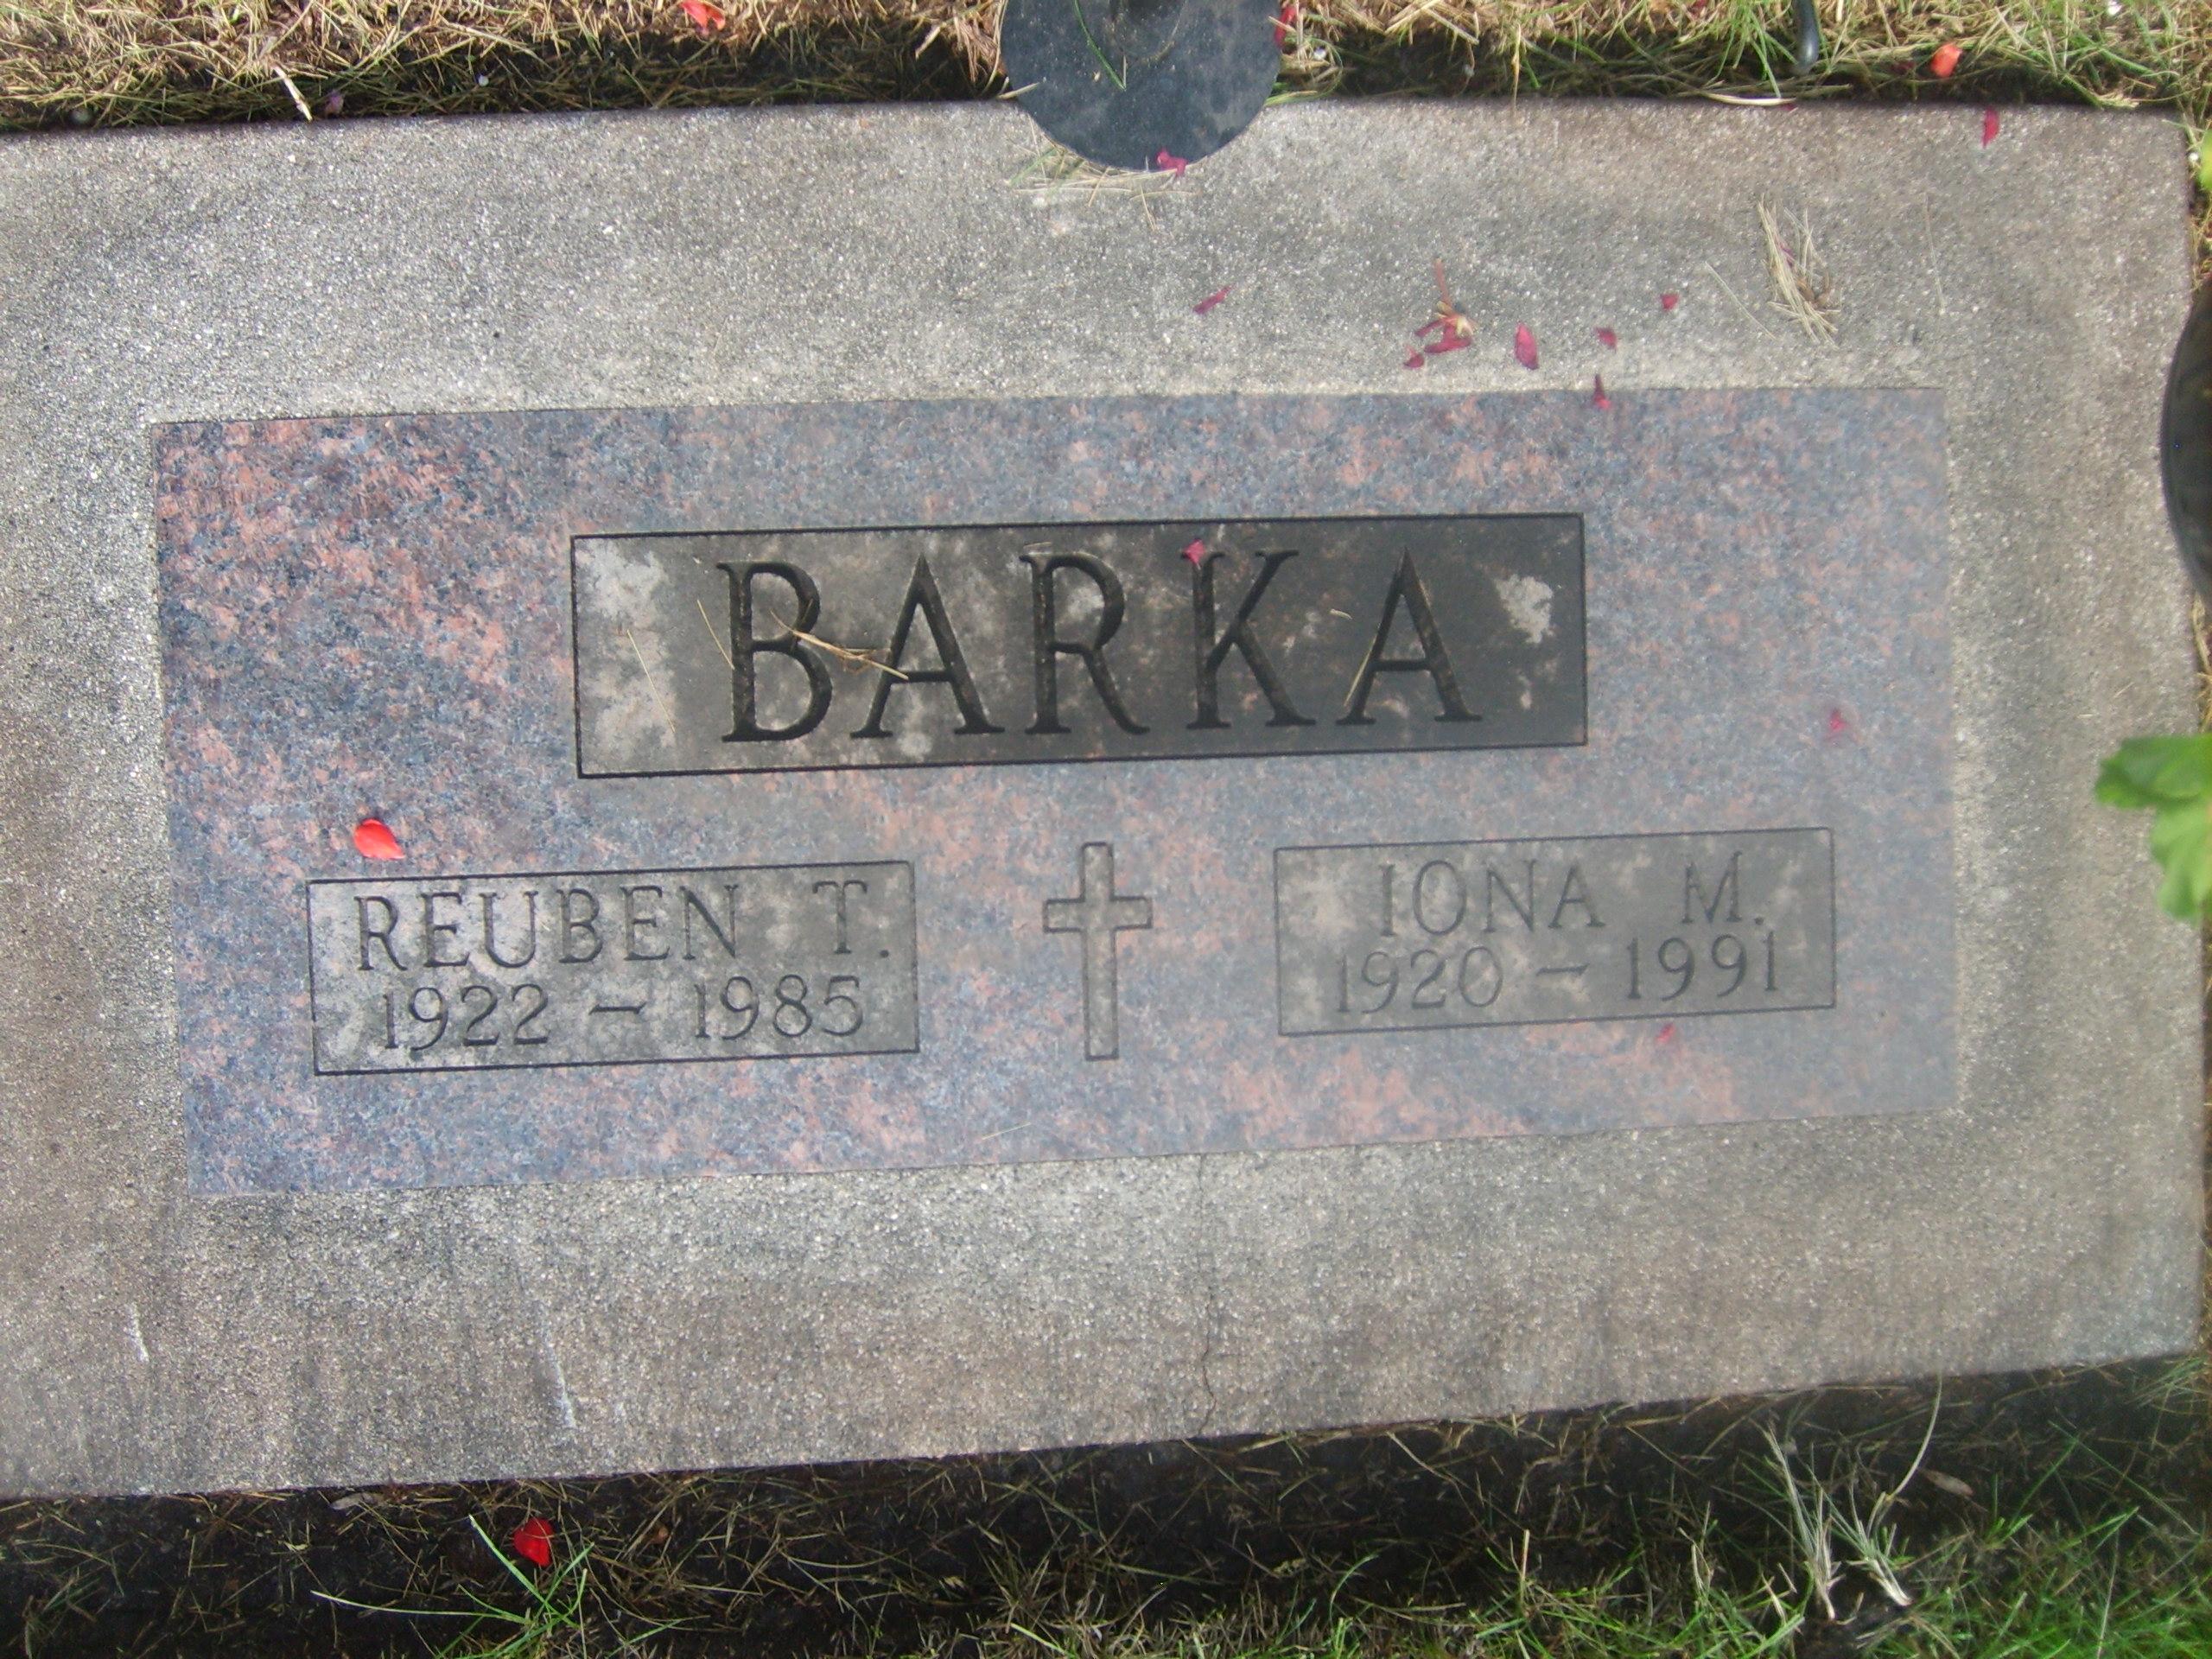 Reuben Thor Barka